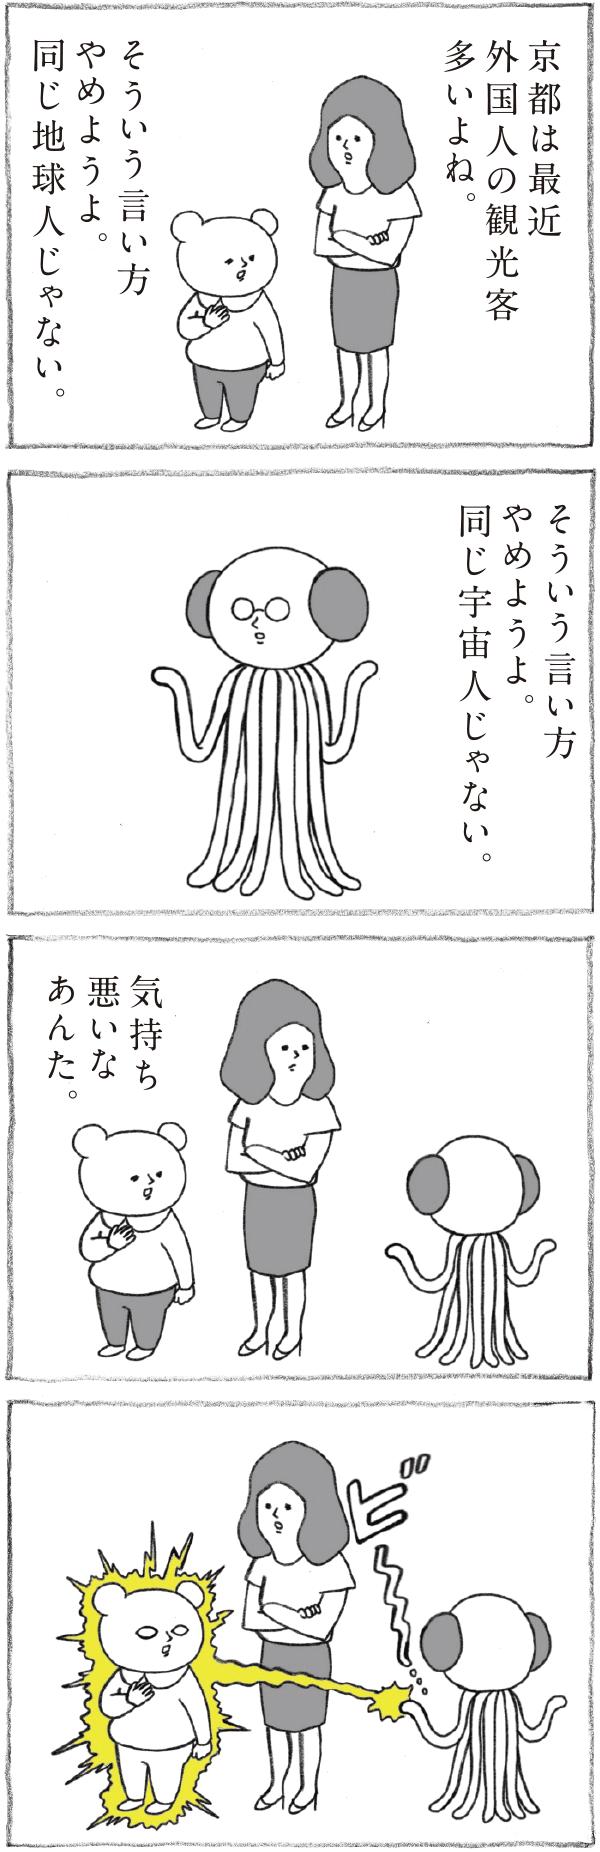 Hanako 1187号:おかわり自由